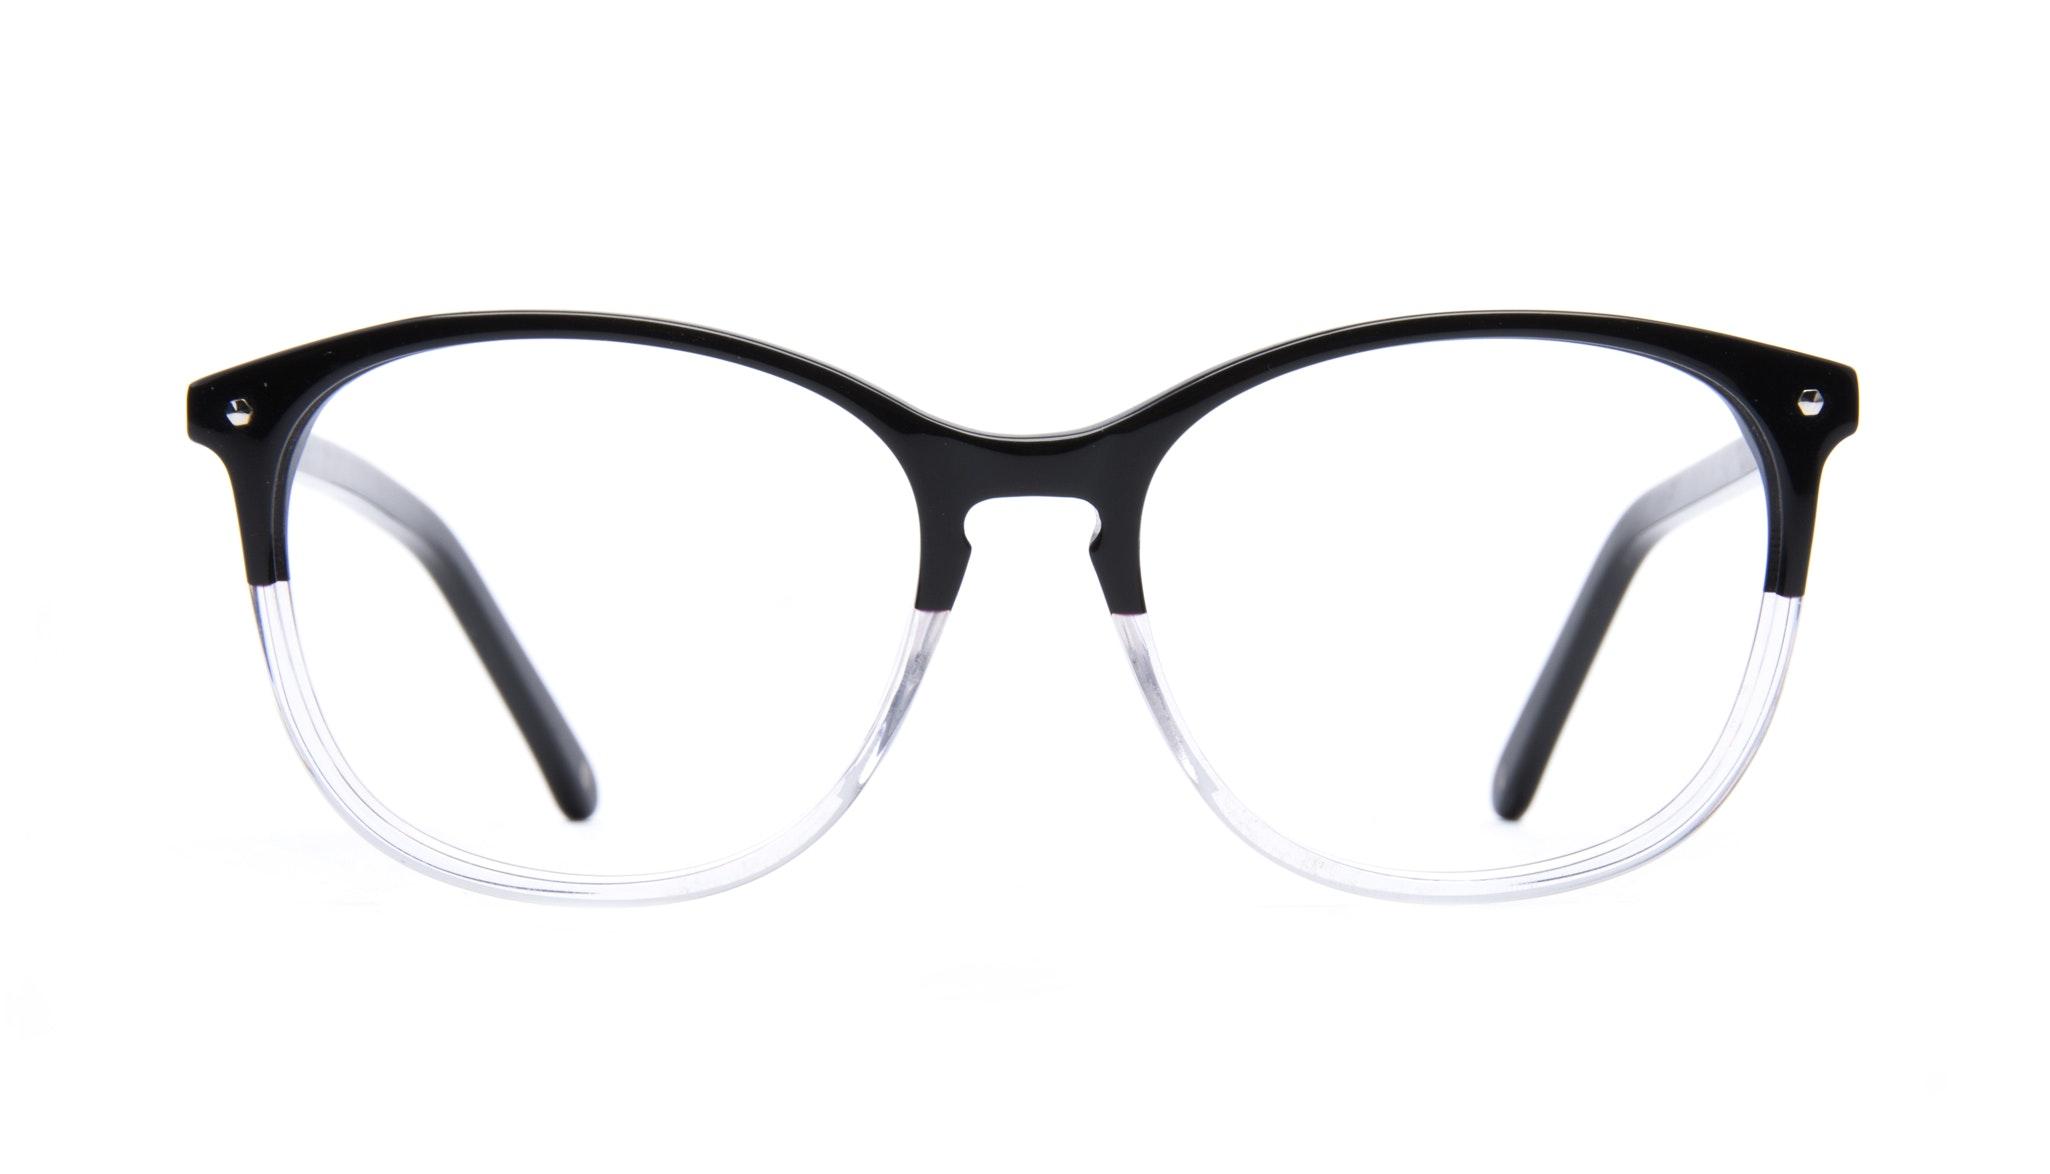 Affordable Fashion Glasses Rectangle Square Round Eyeglasses Women Nadine Two Tone Black